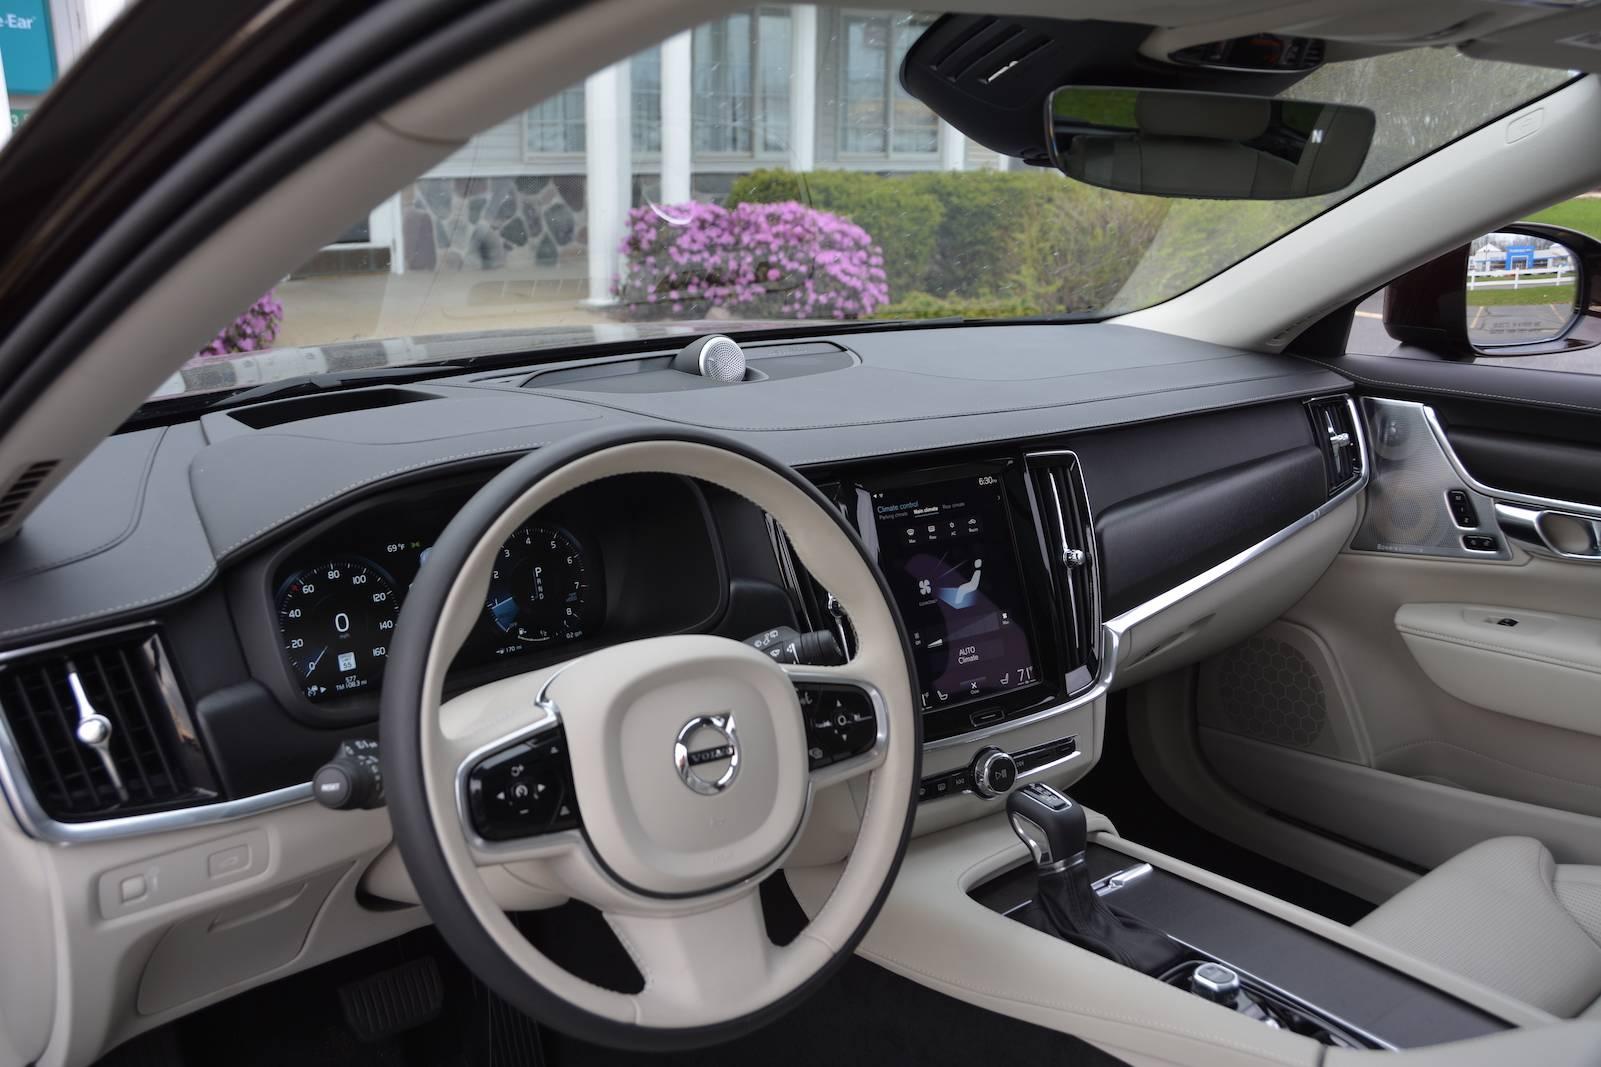 2017 Volvo V90 Cross Country AWD Review - GTspirit